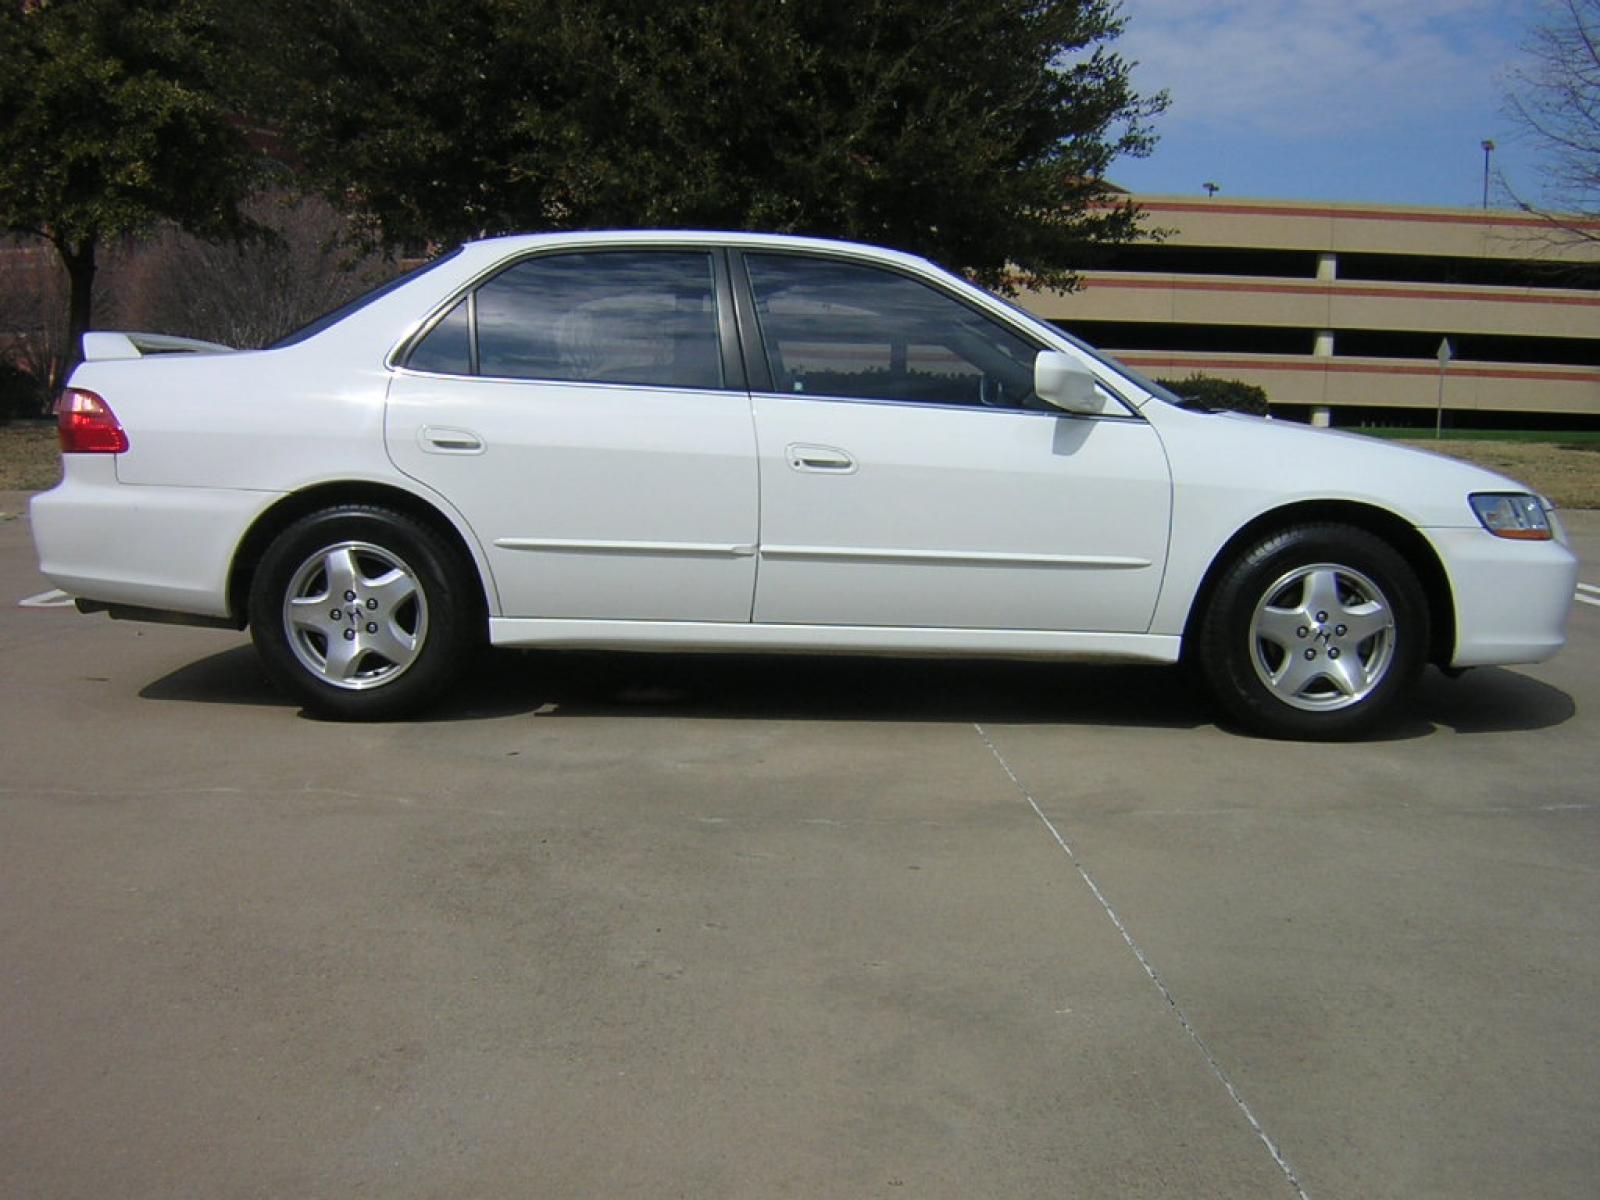 800 1024 1280 1600 Origin 2001 Honda Accord ...